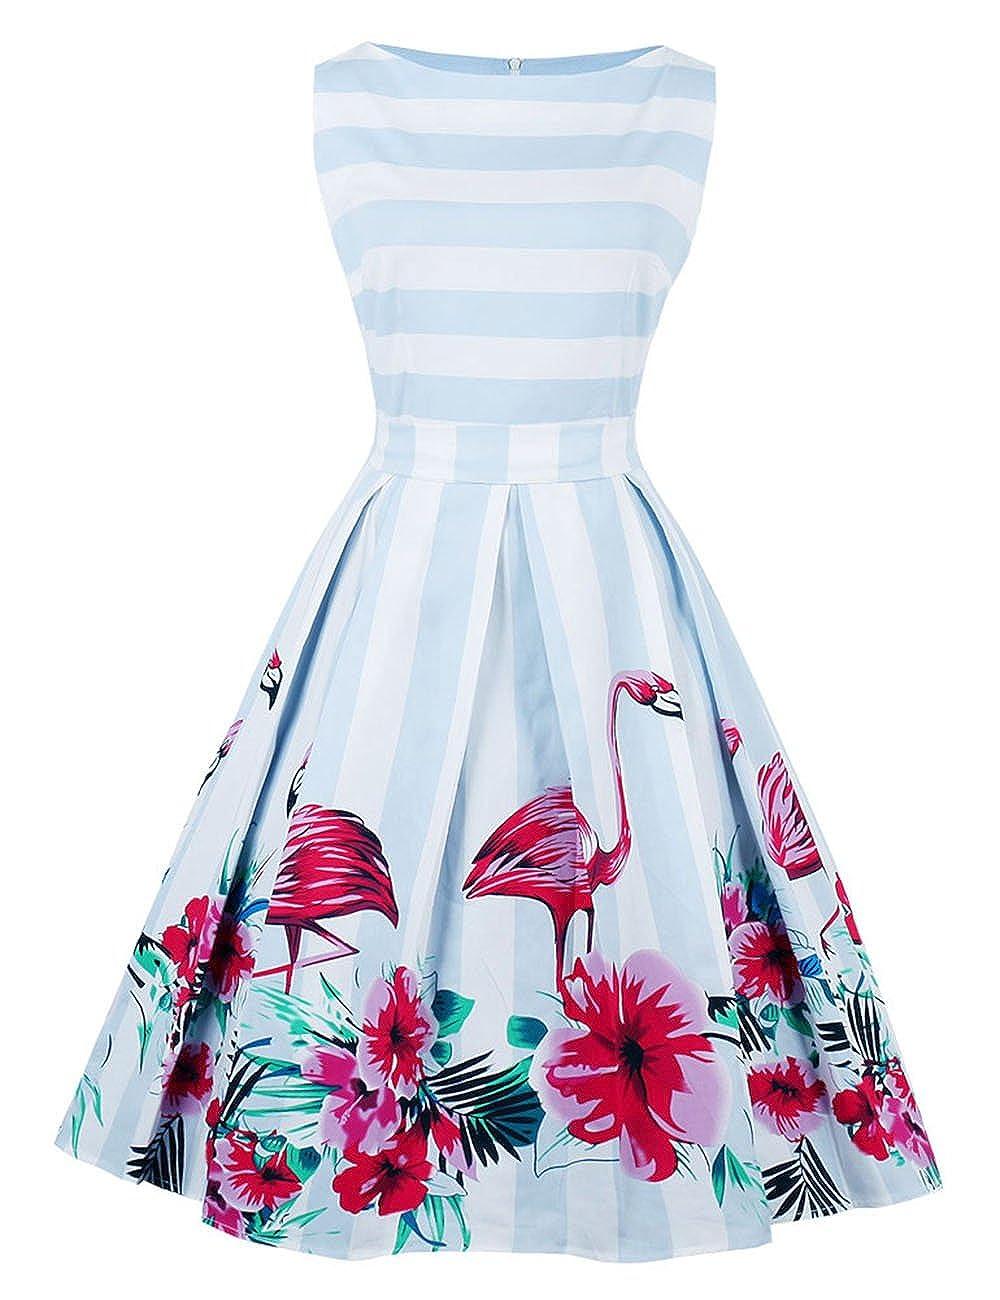 Elfremore Striped Sleeveless Dress Flamingo Print Slim Waist Swing Dress